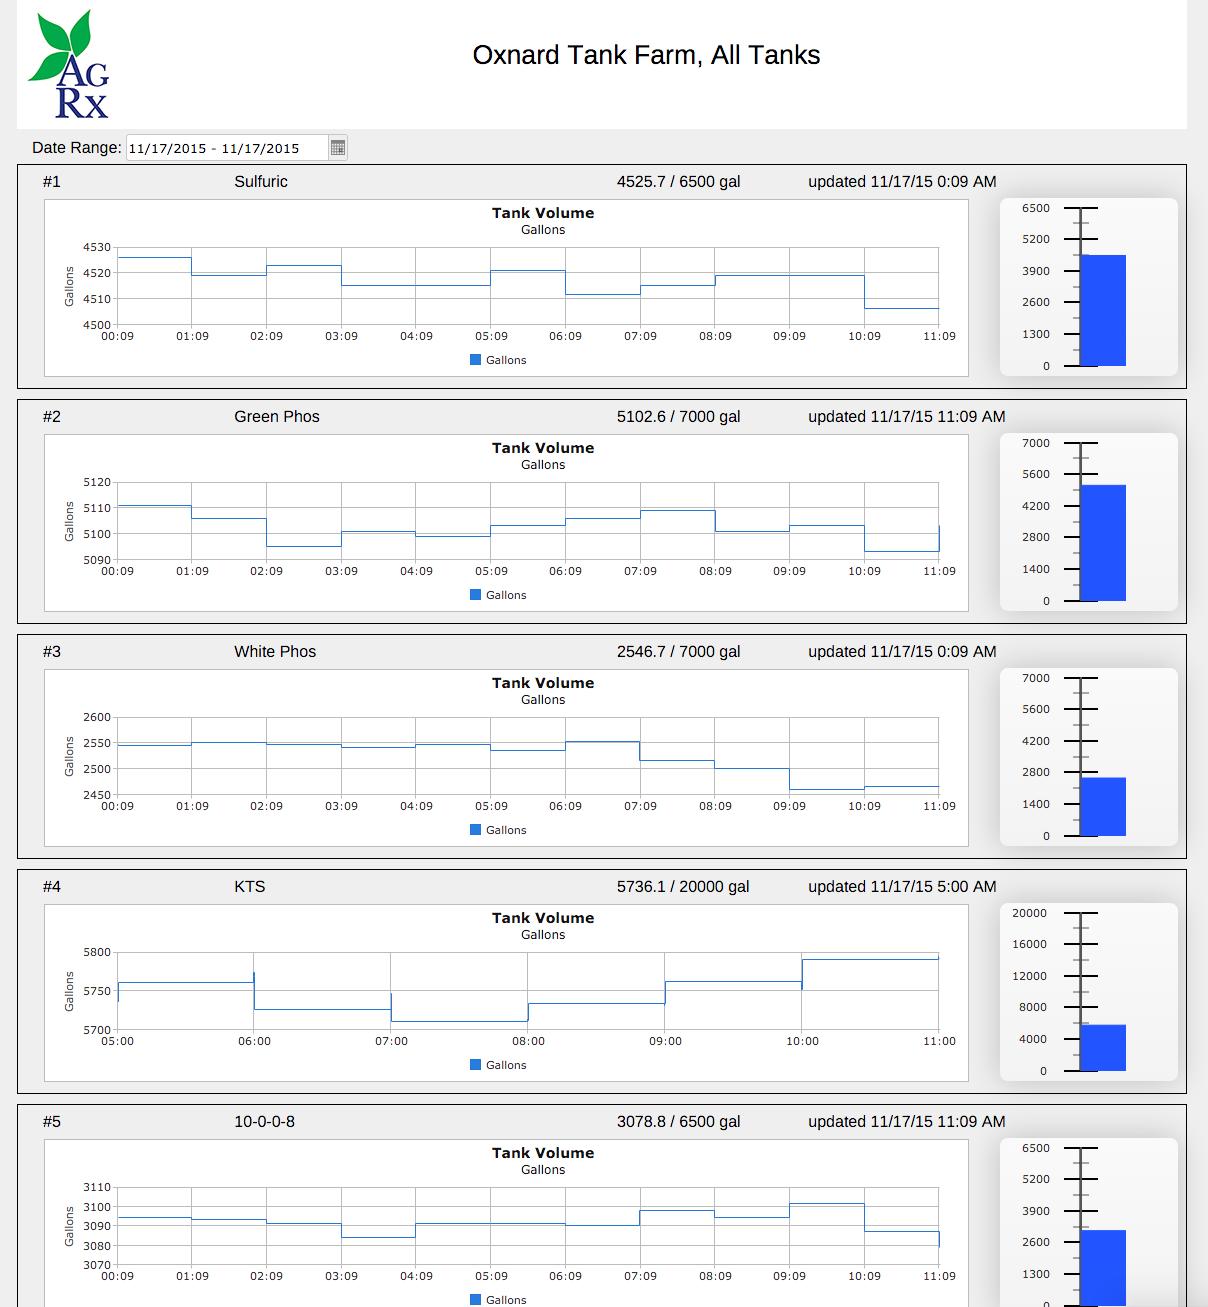 Valarm Tank Level Monitoring Remote Telemetry Monitoring Sensors Tanks Real-Time AGRX 1